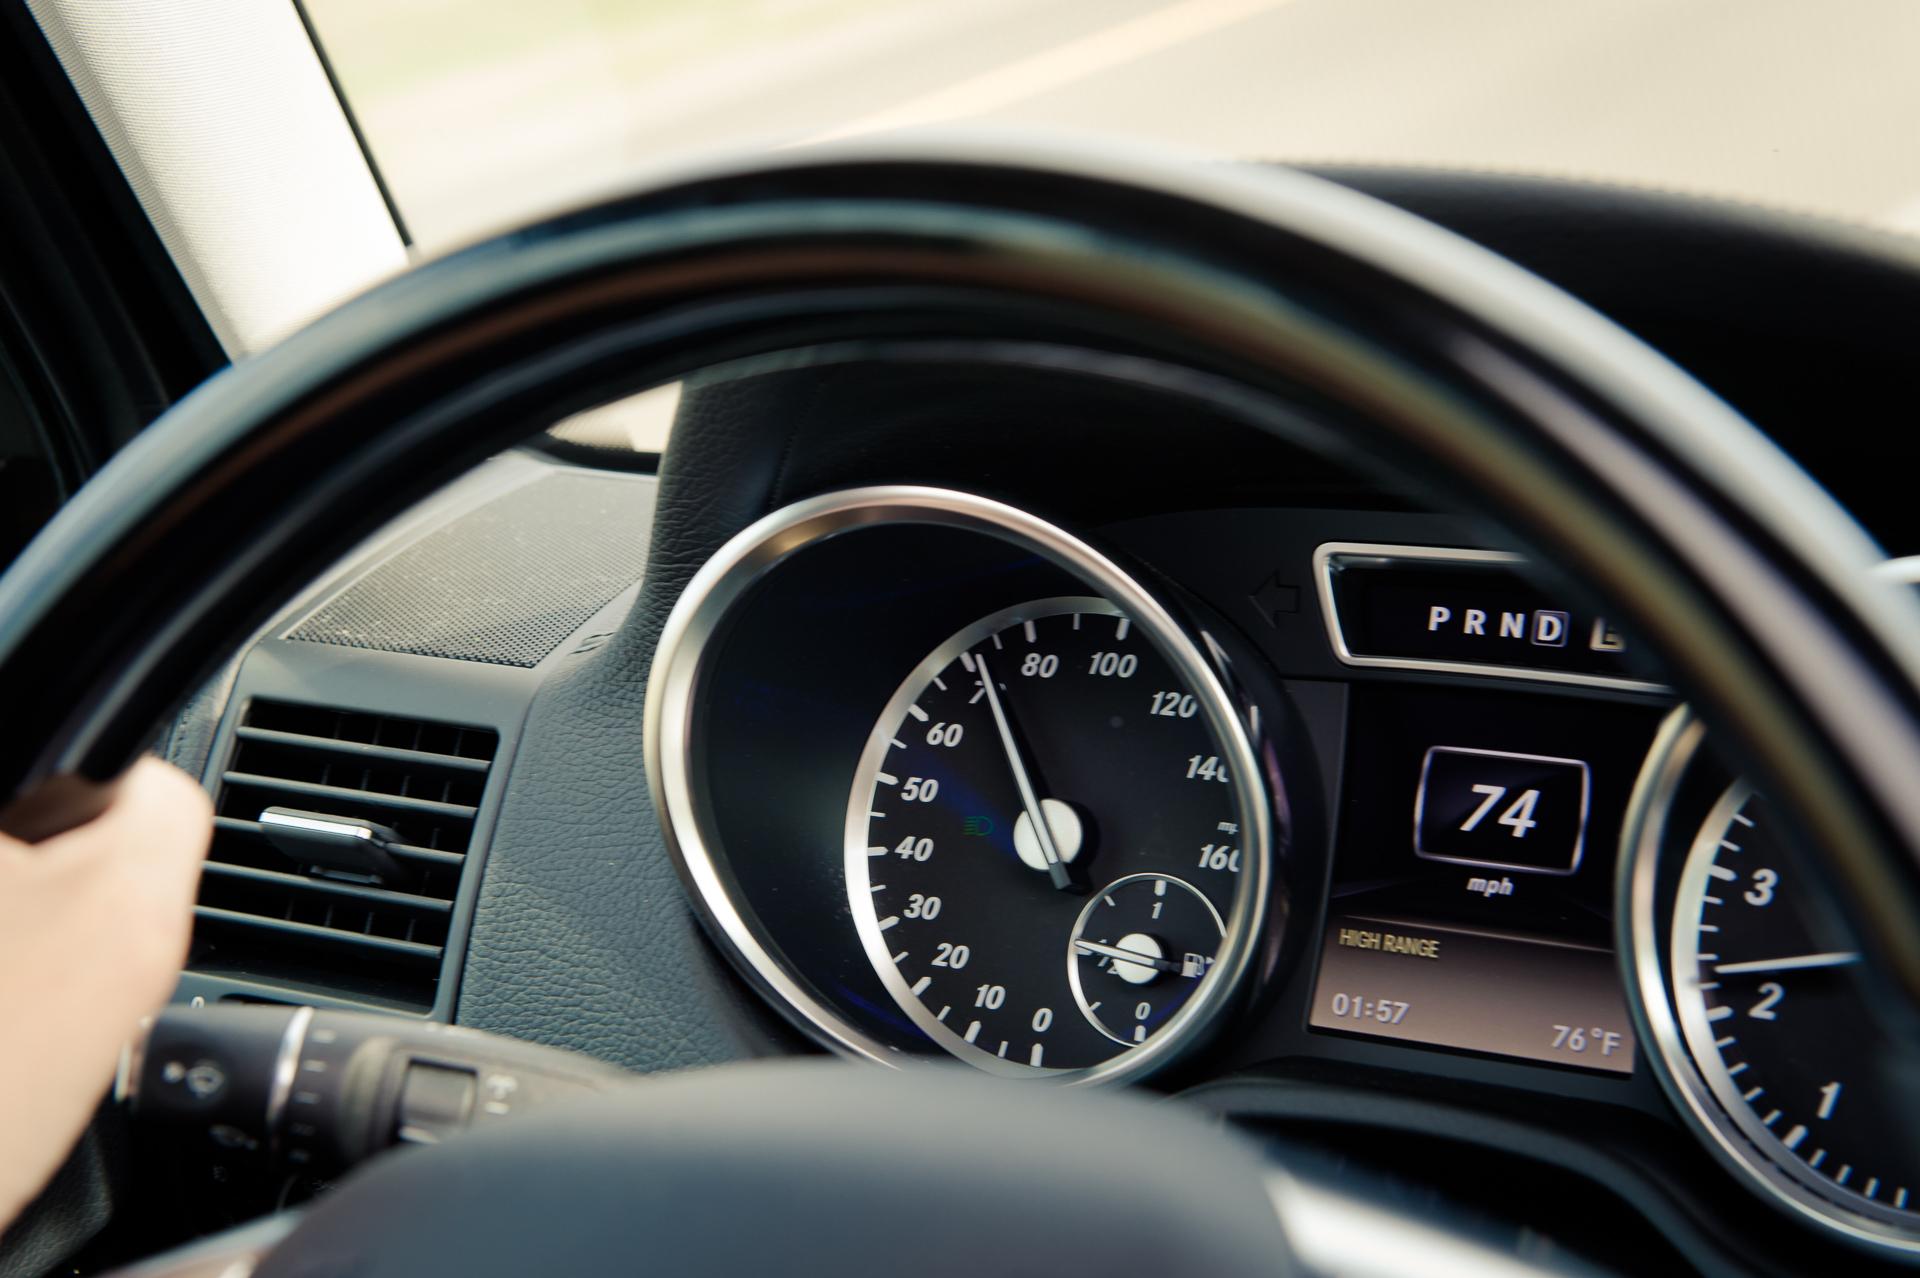 2014-Mercedes-Benz-G500-G550-braun-Kalifornien-mbrt14-19